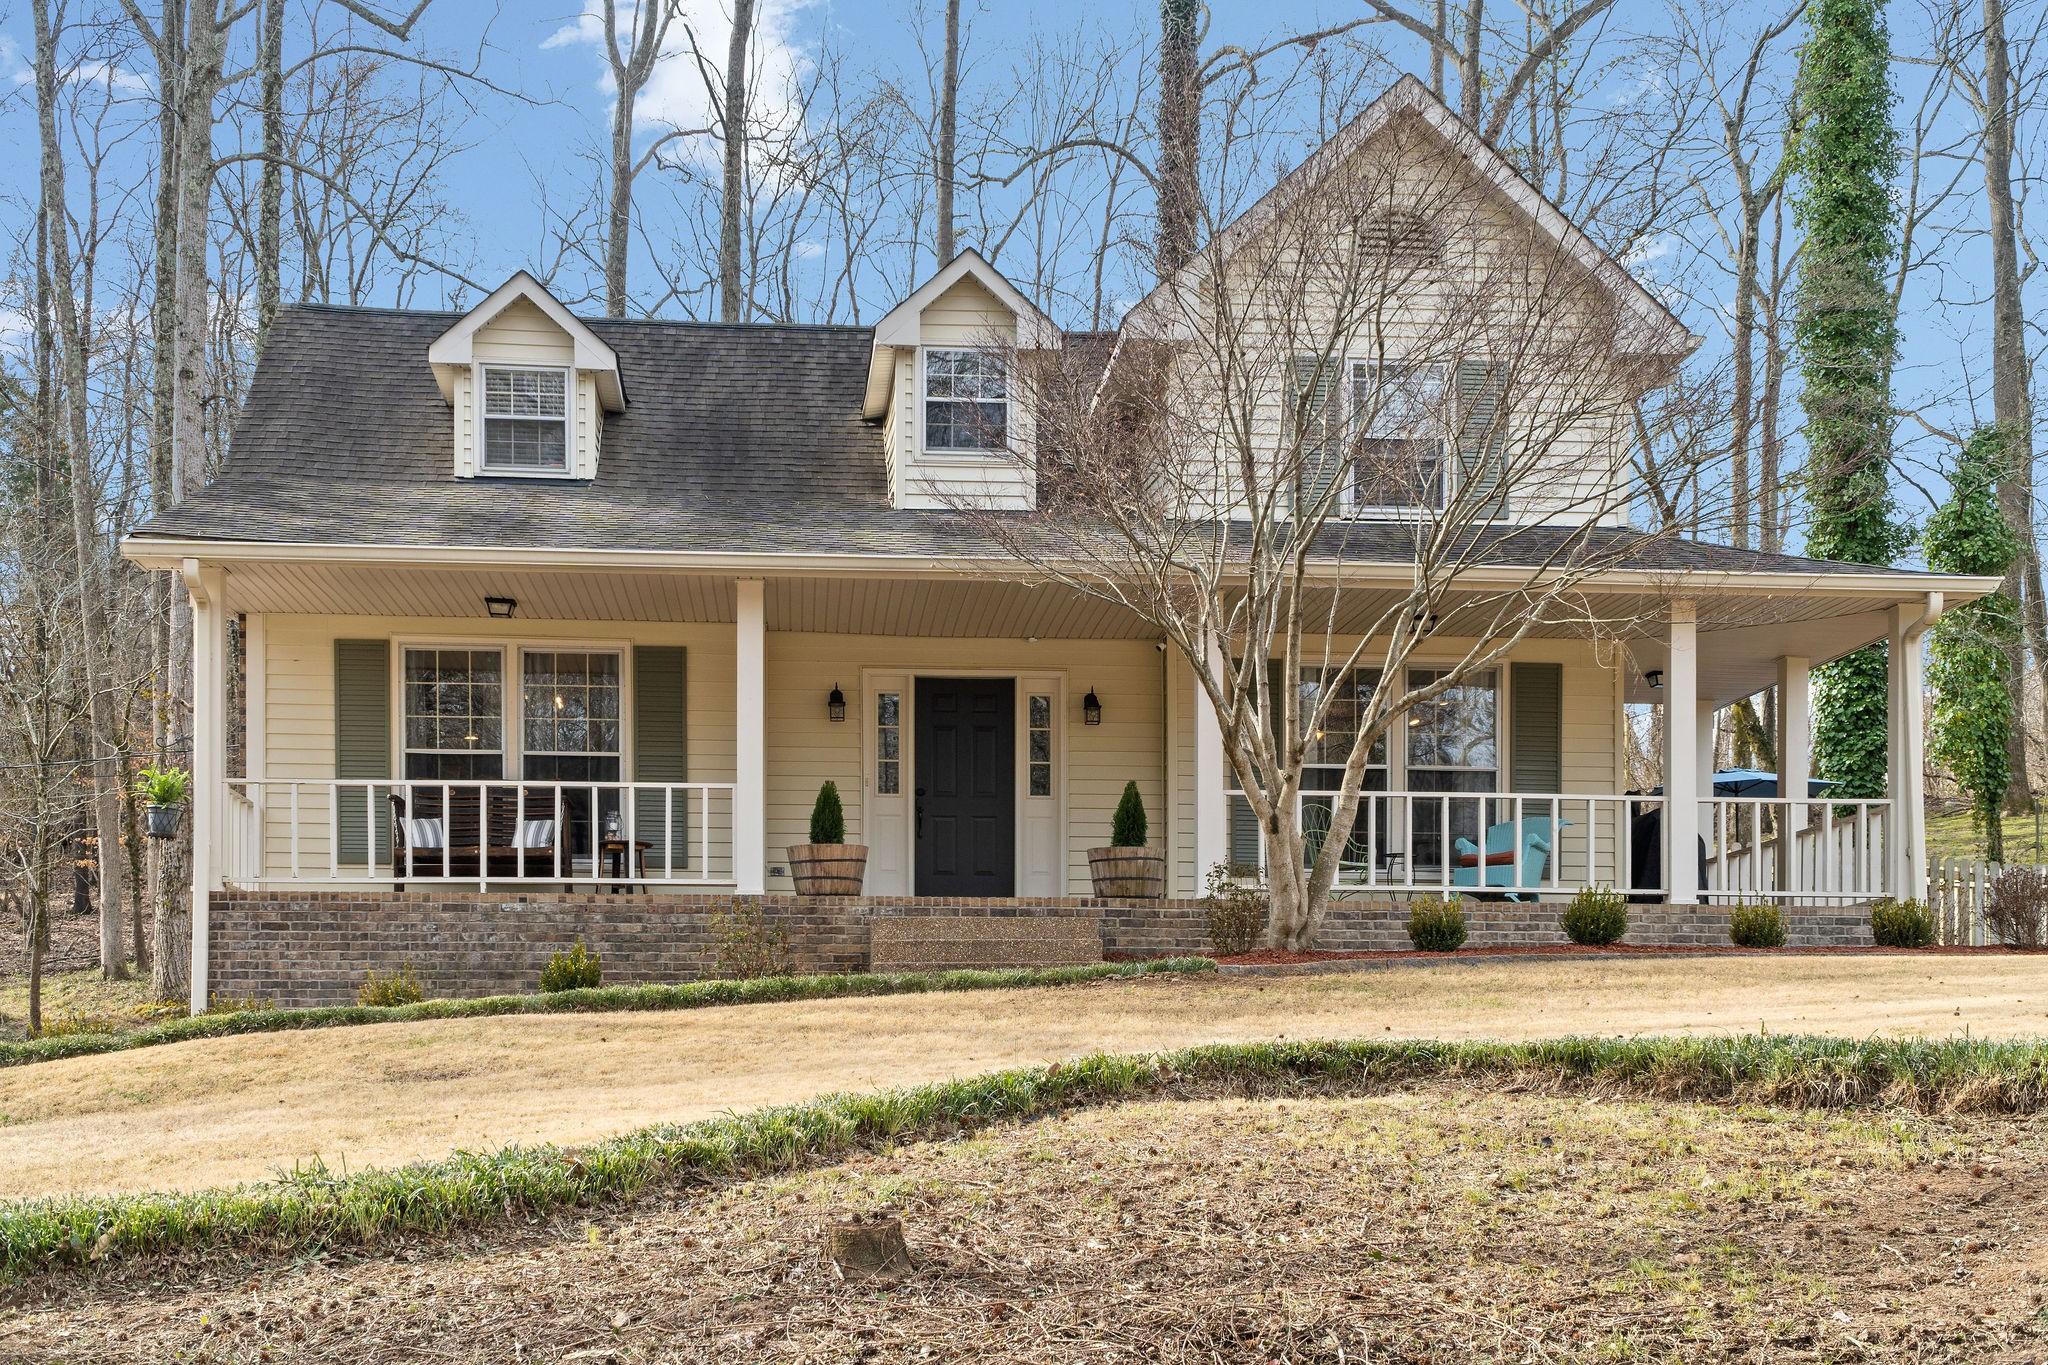 1708 Merritt Dr Property Photo - Clarksville, TN real estate listing